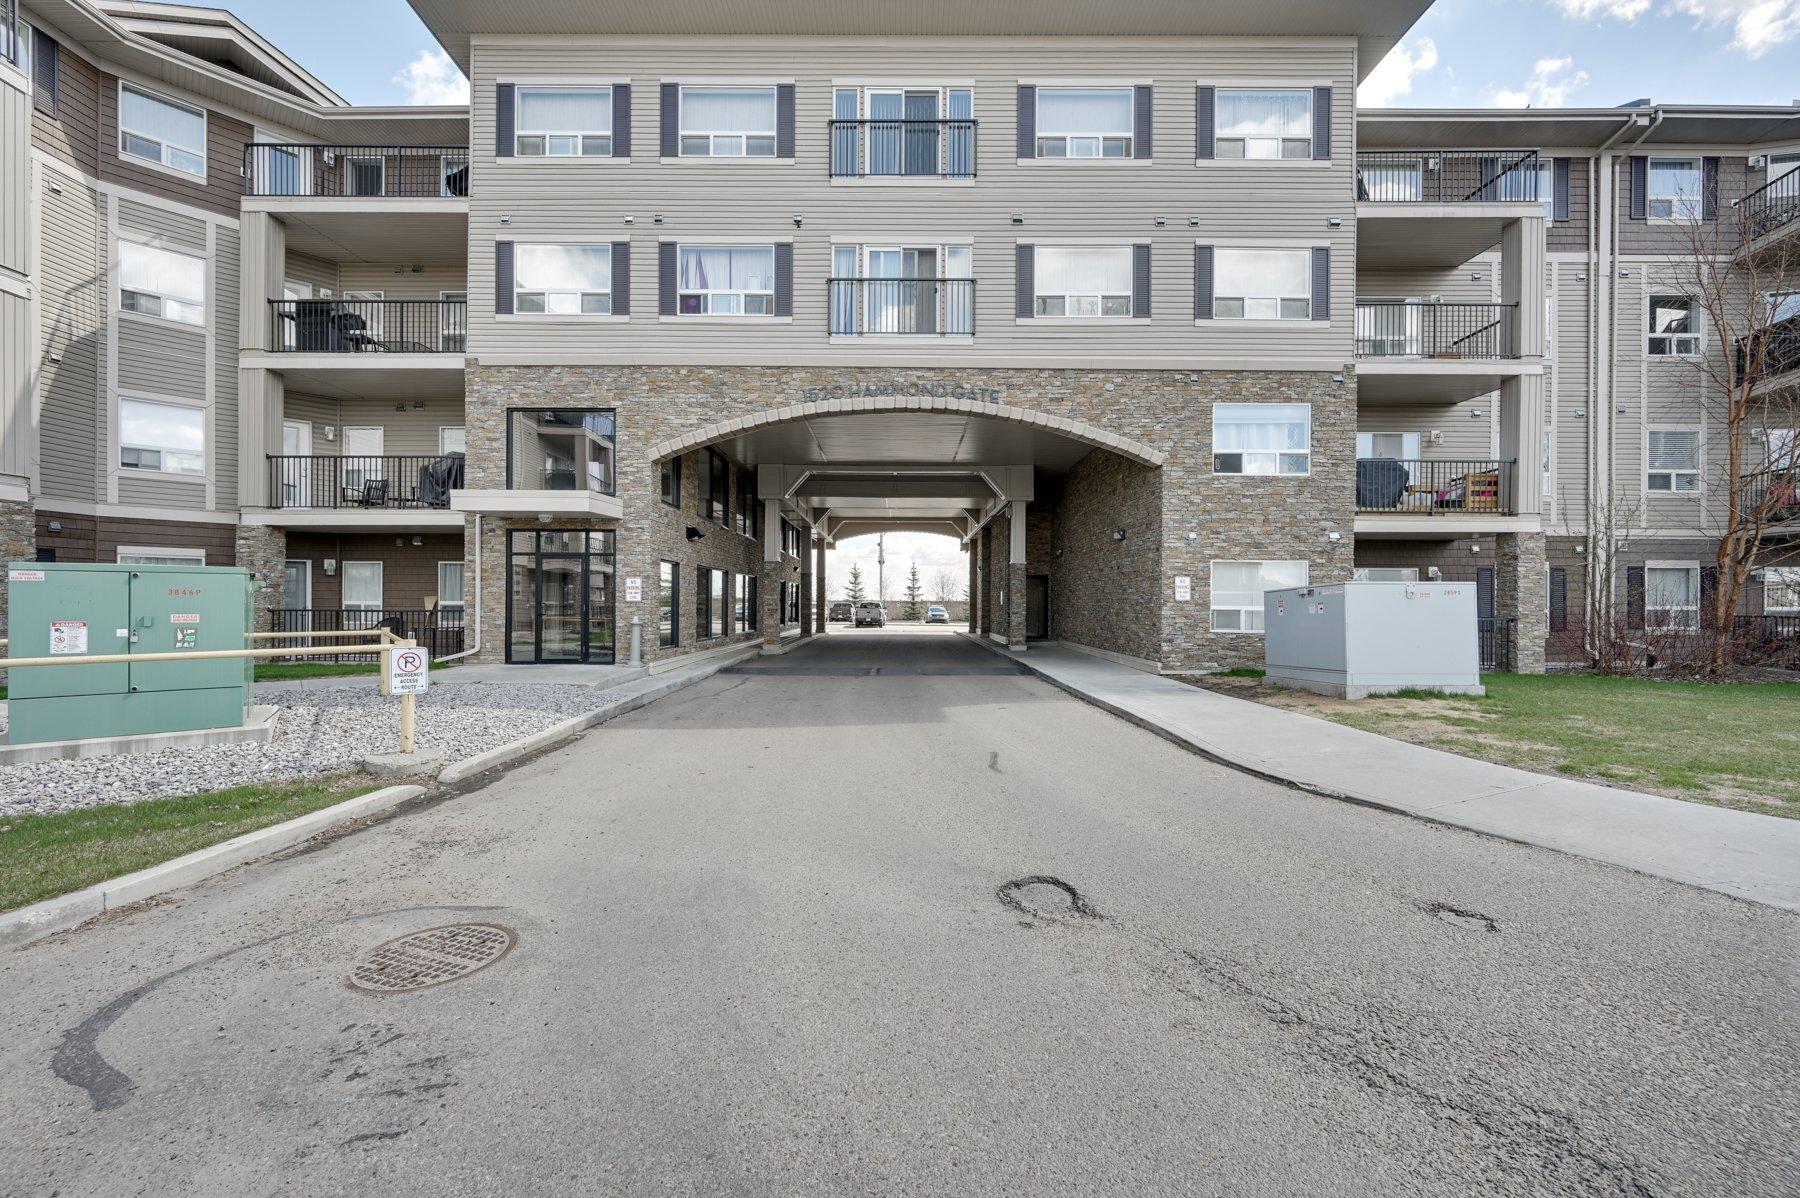 Main Photo: 240 1520 Hammond Gate NW in Edmonton: Condo for sale